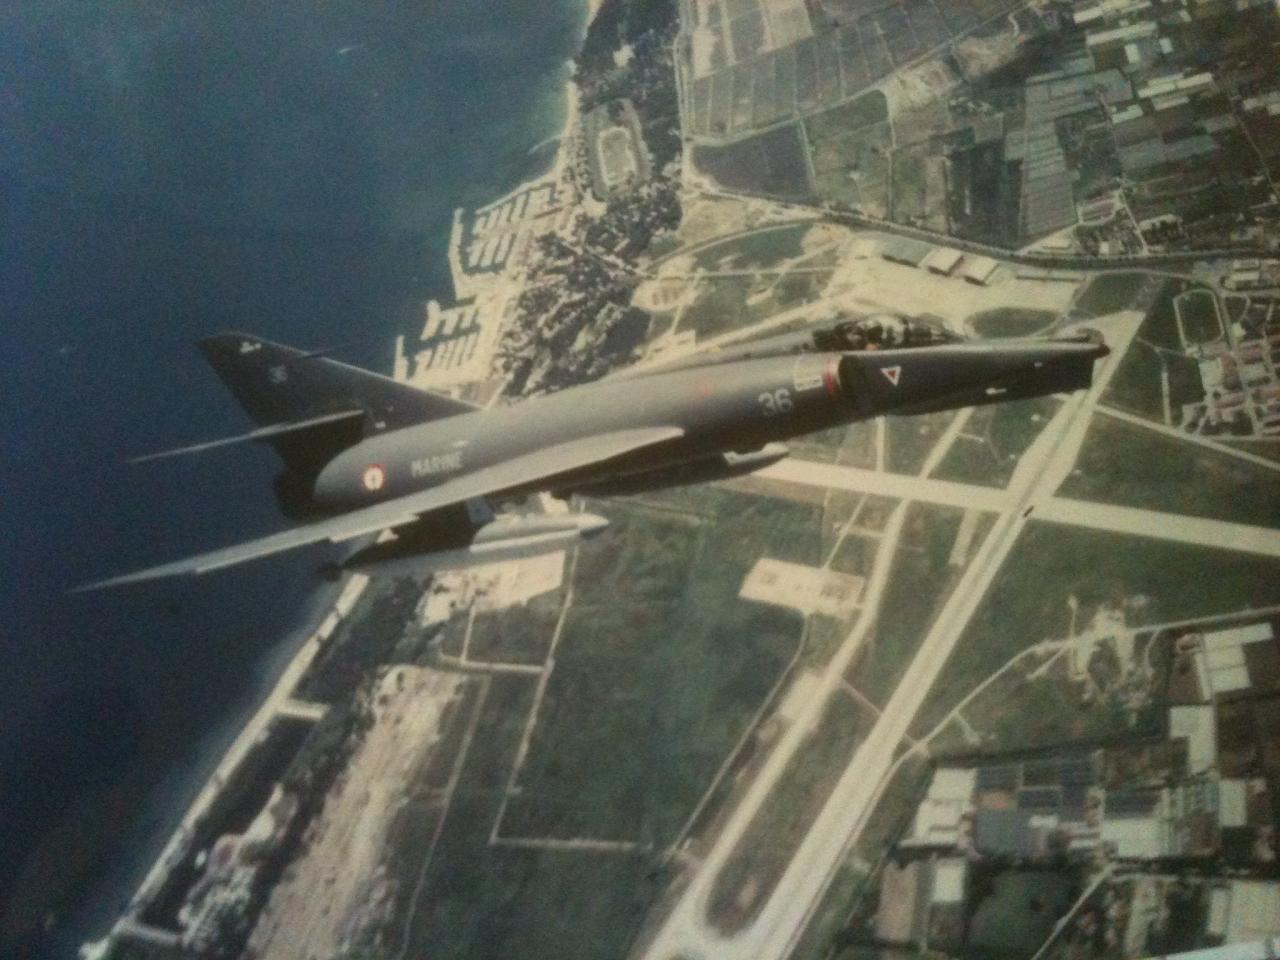 1989, étendard IVM n°36, escadrille 59S, ban hyères ...